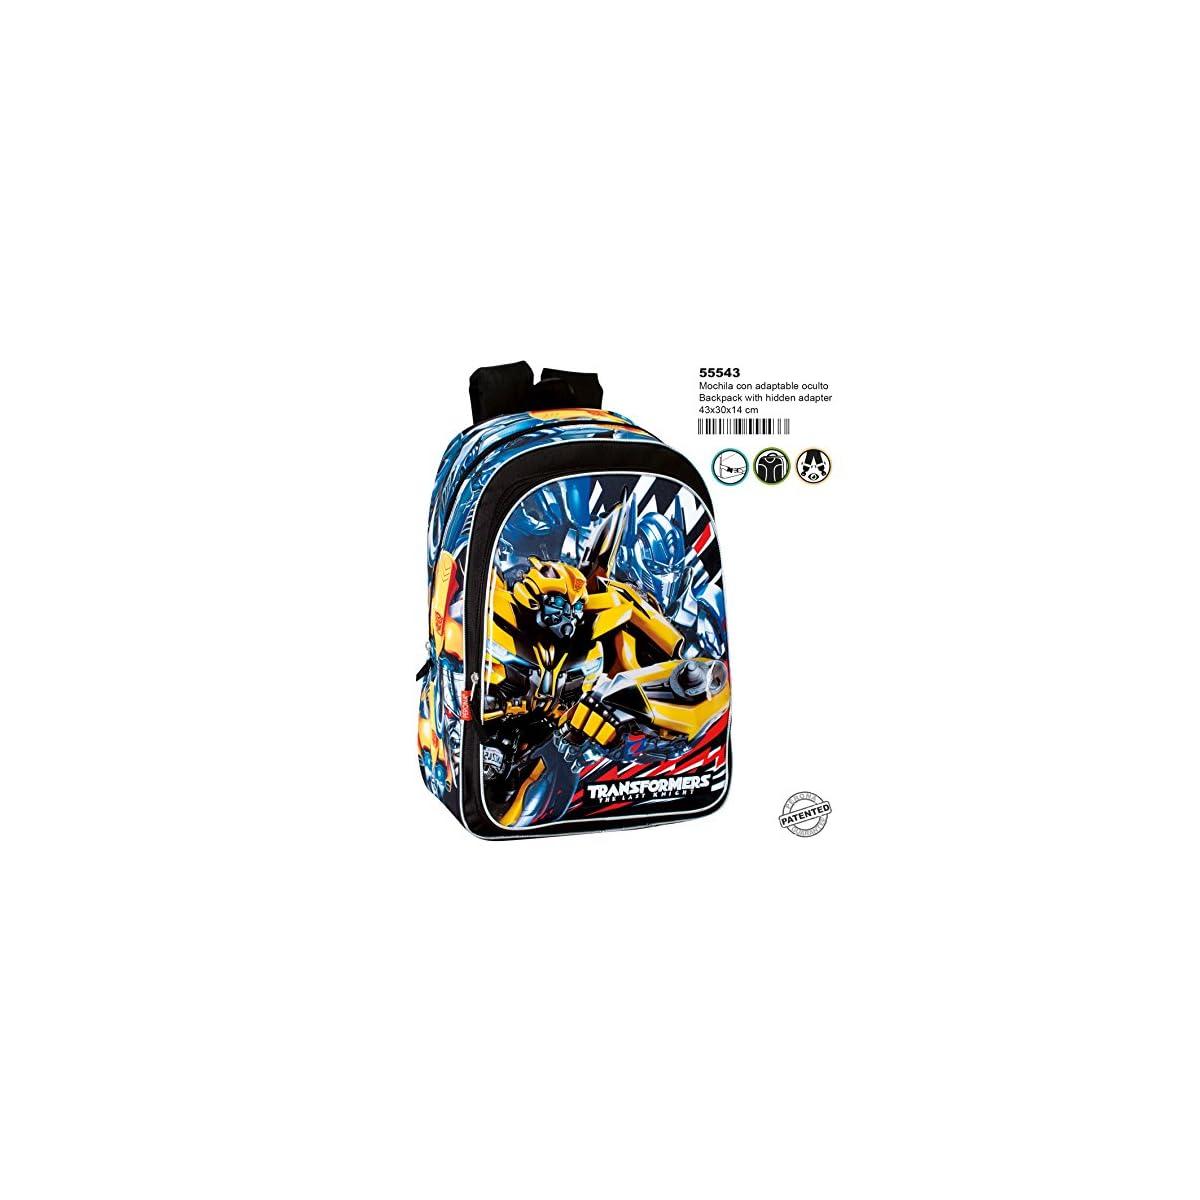 61%2BAVfKquRL. SS1200  - Transformers Mochila Grande Adaptable a Carro